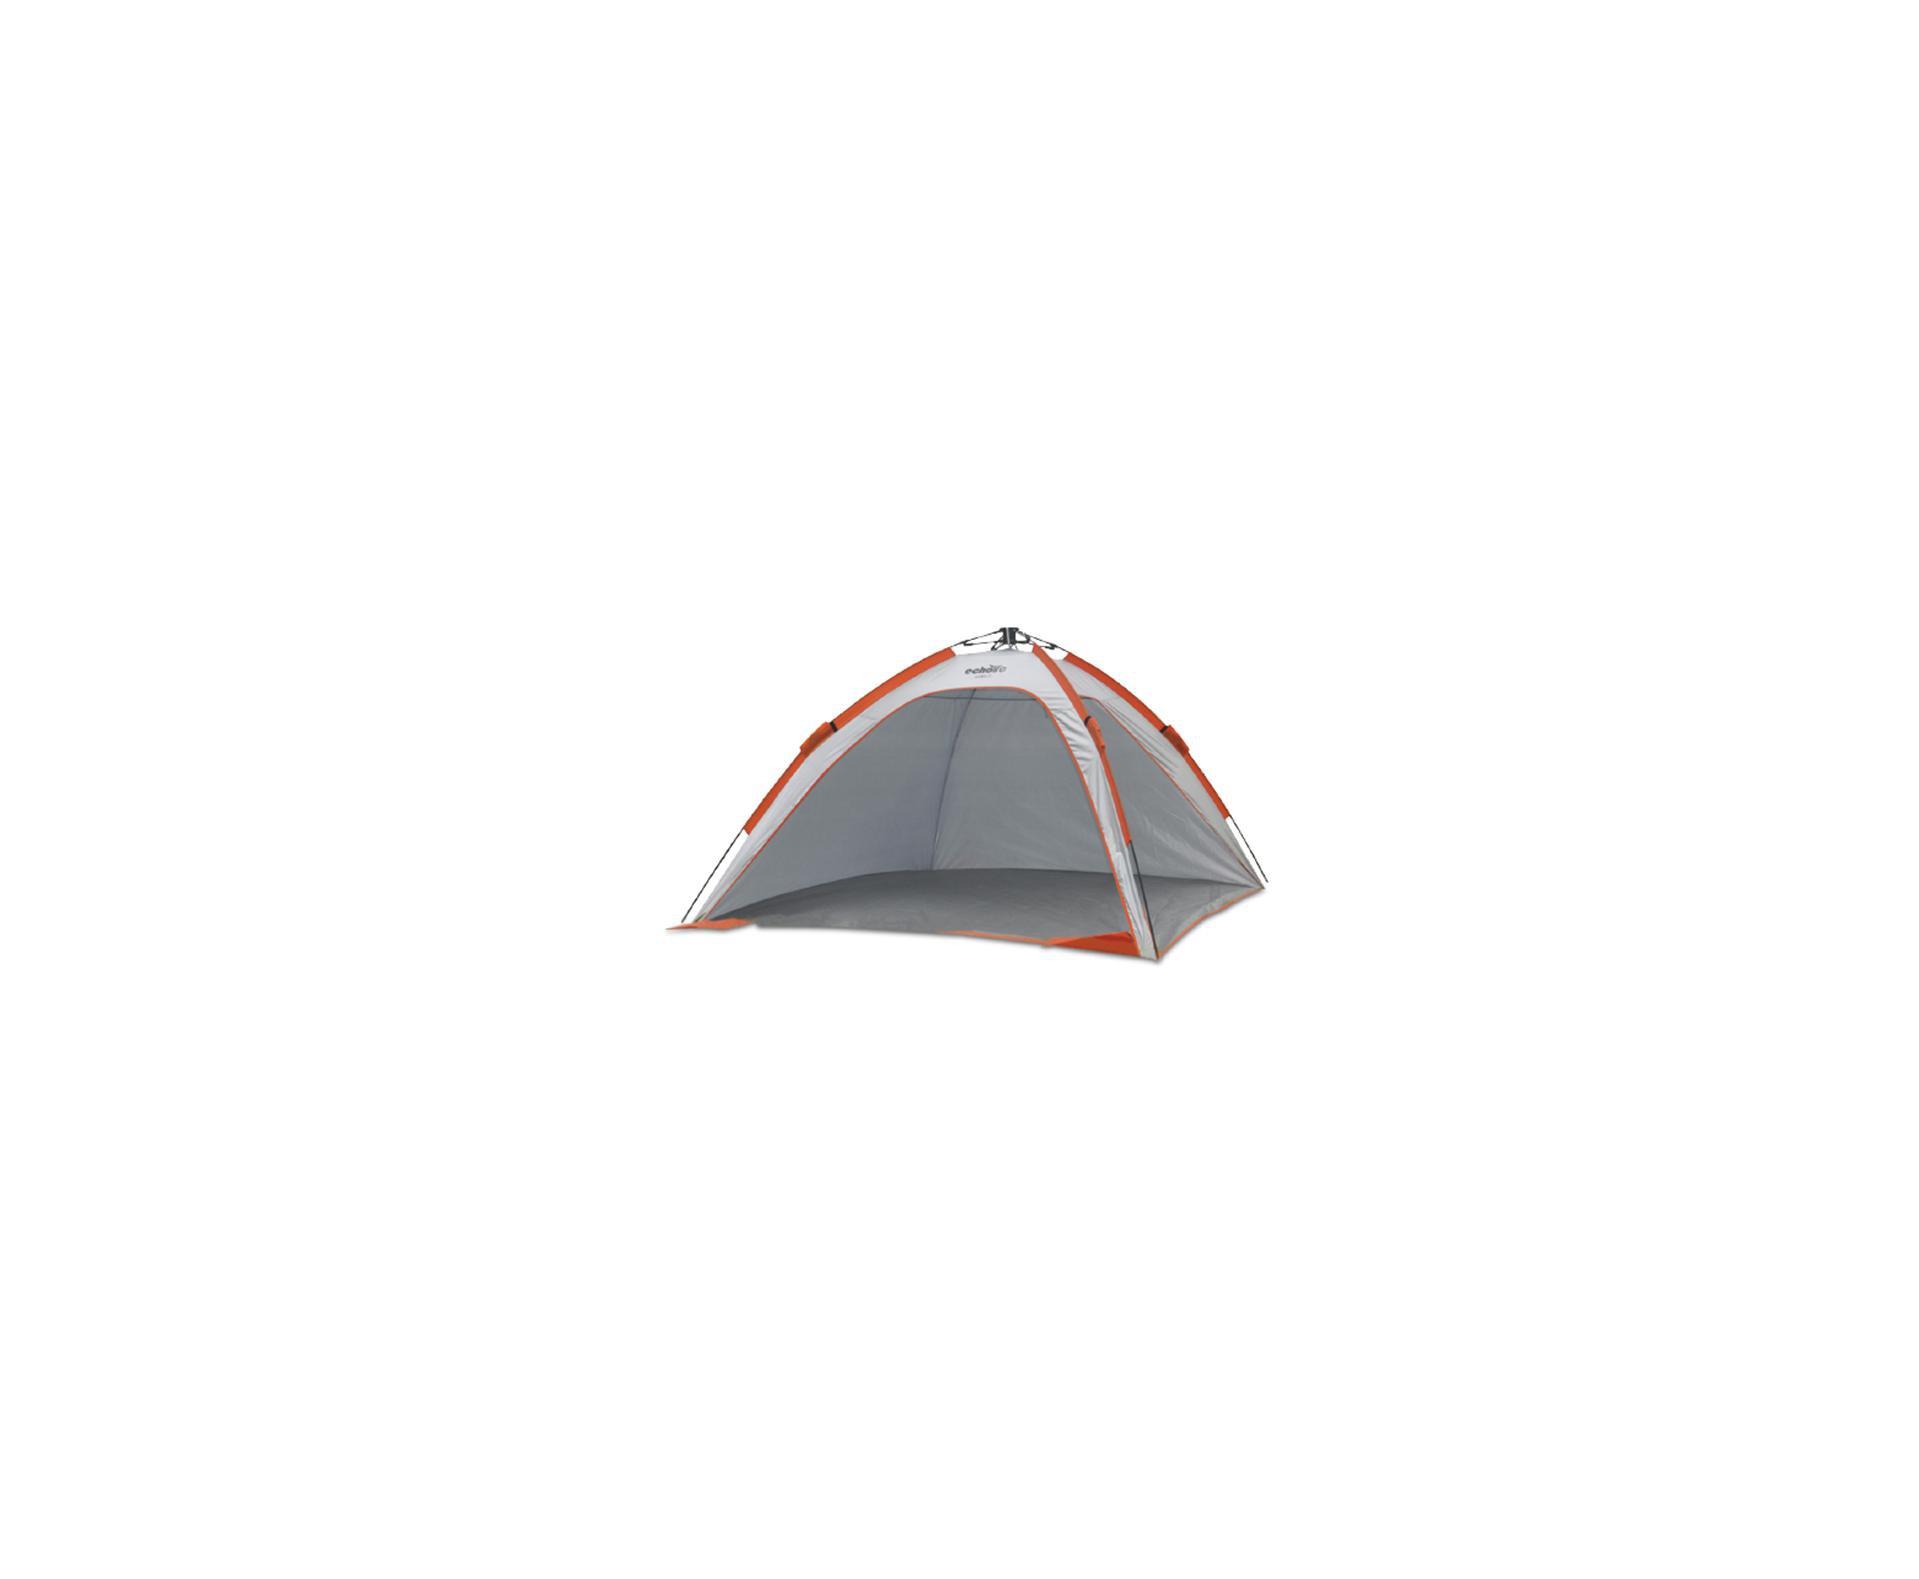 Barraca De Praia E Camping Hawaí - Automática - Echolife